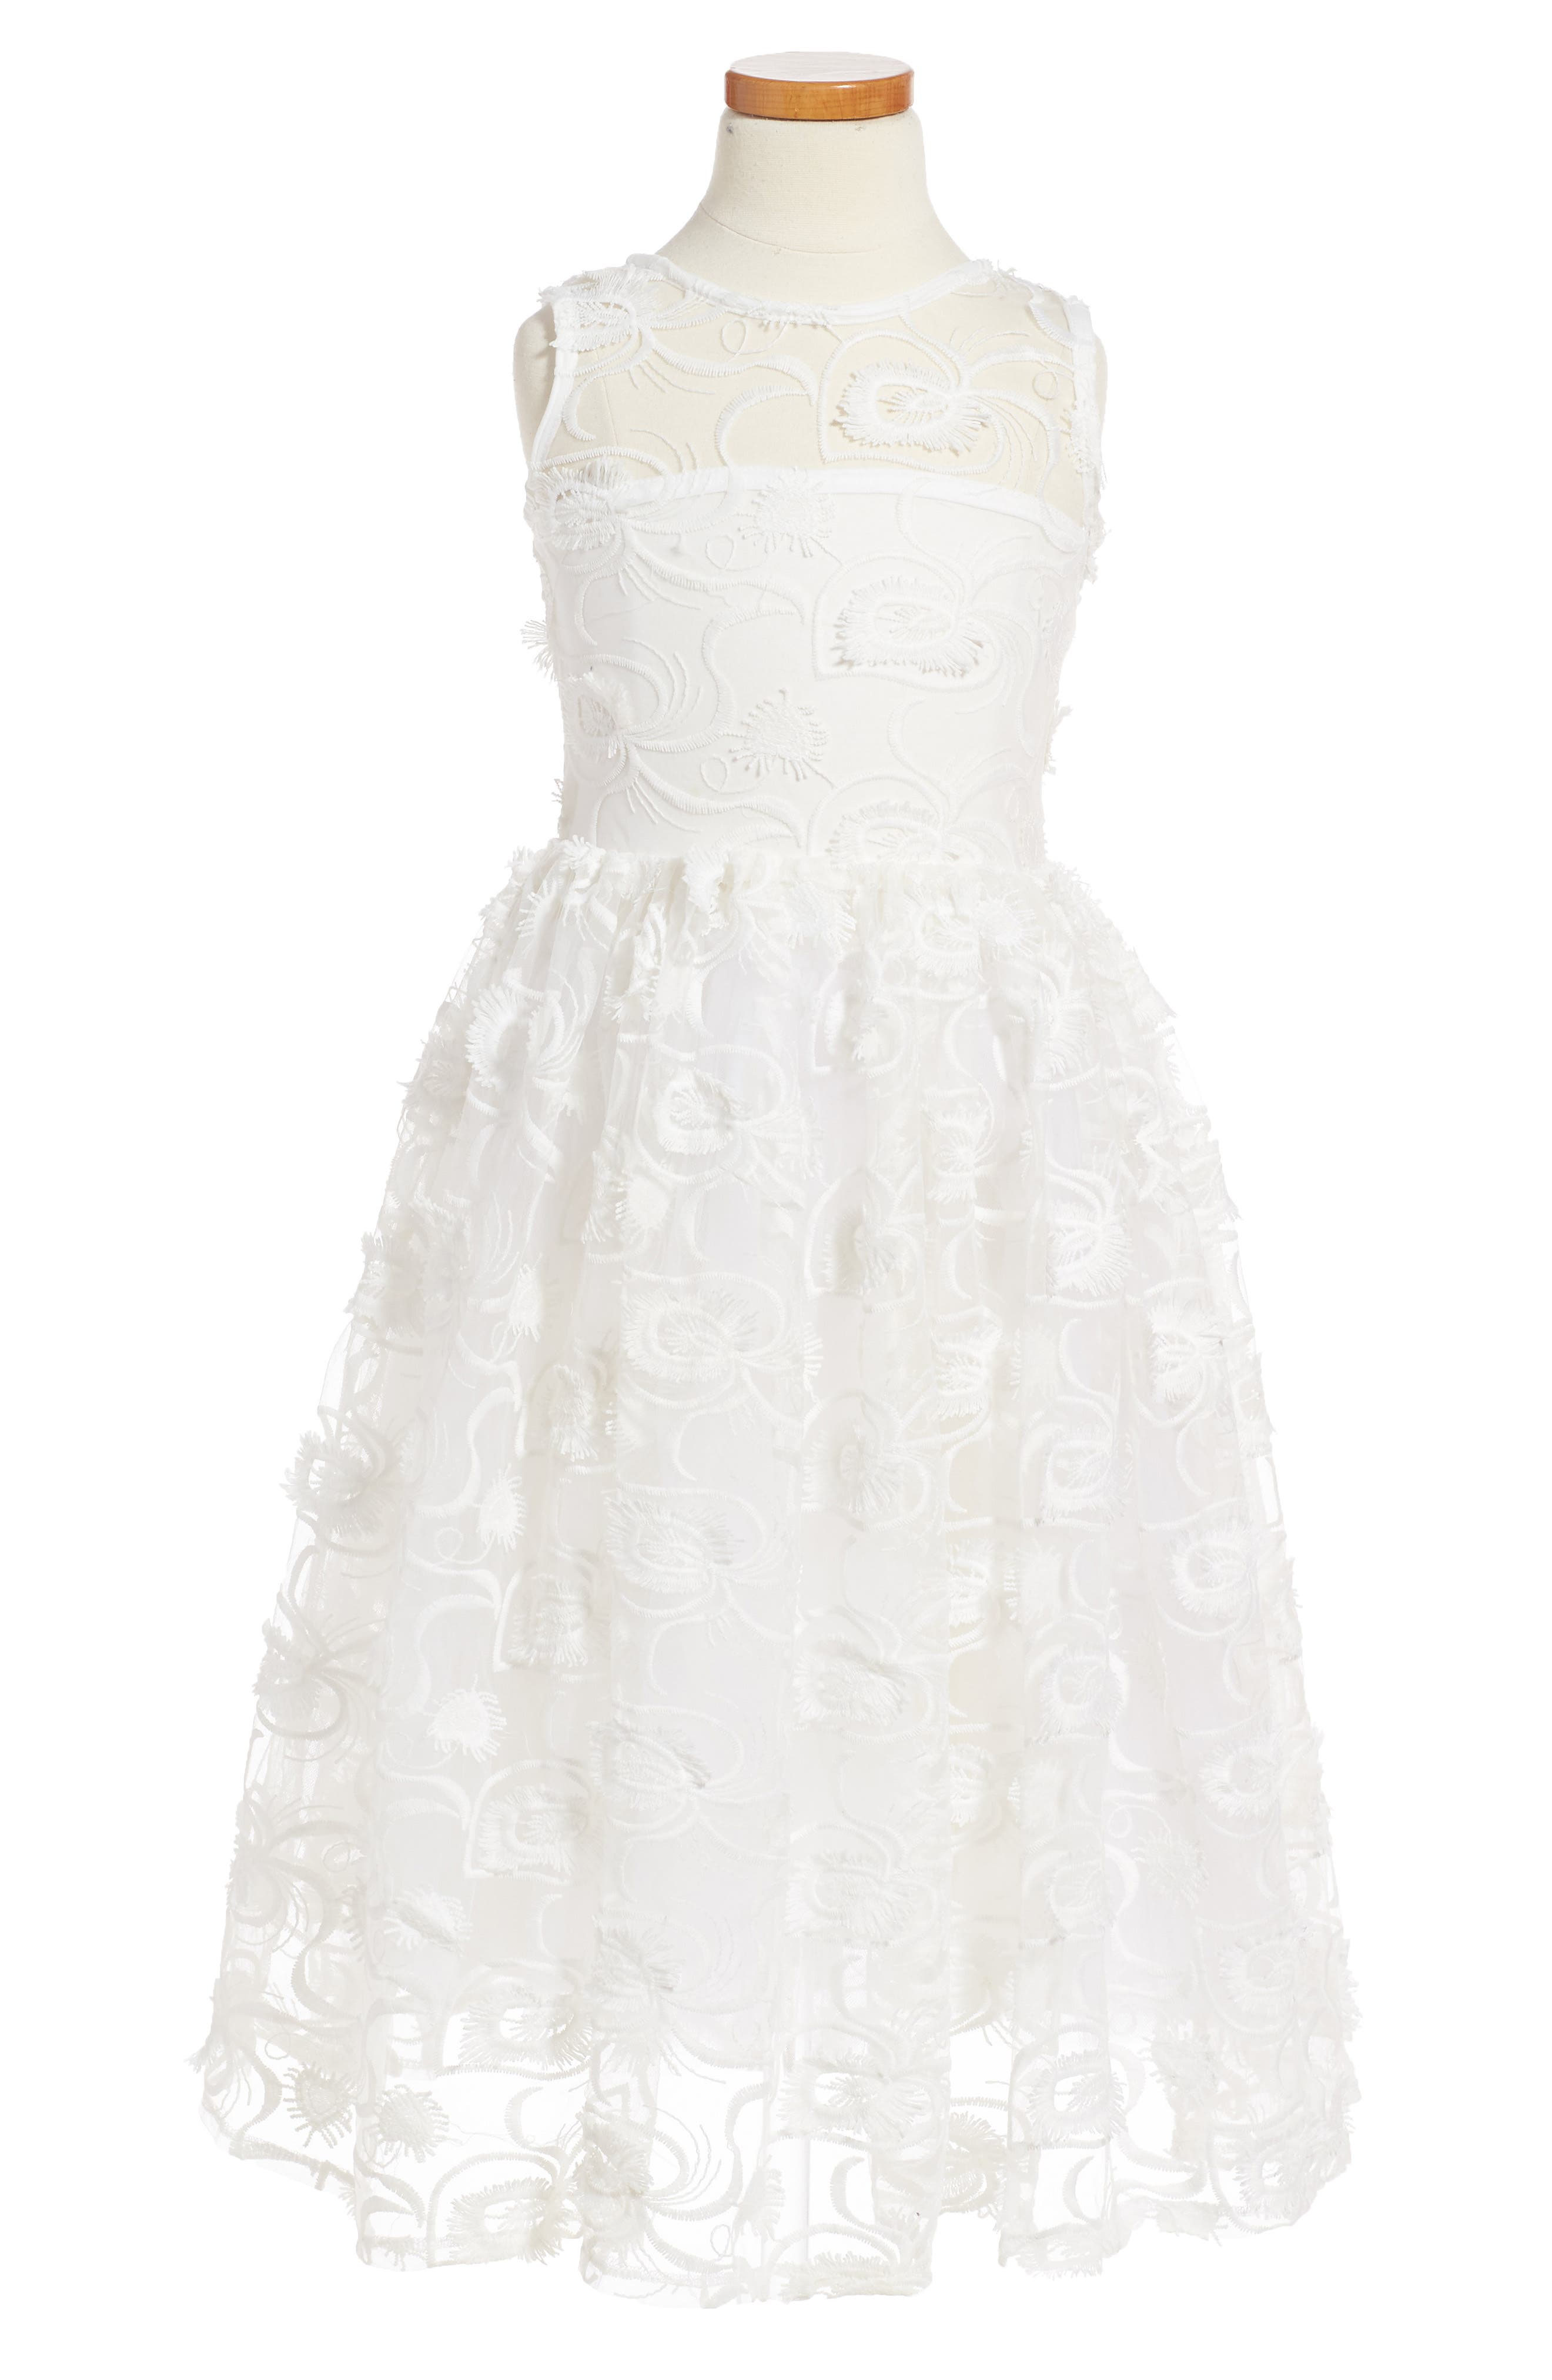 Fiveloaves Twofish Hepburn Embroidered Dress (Little Girls & Big Girls)